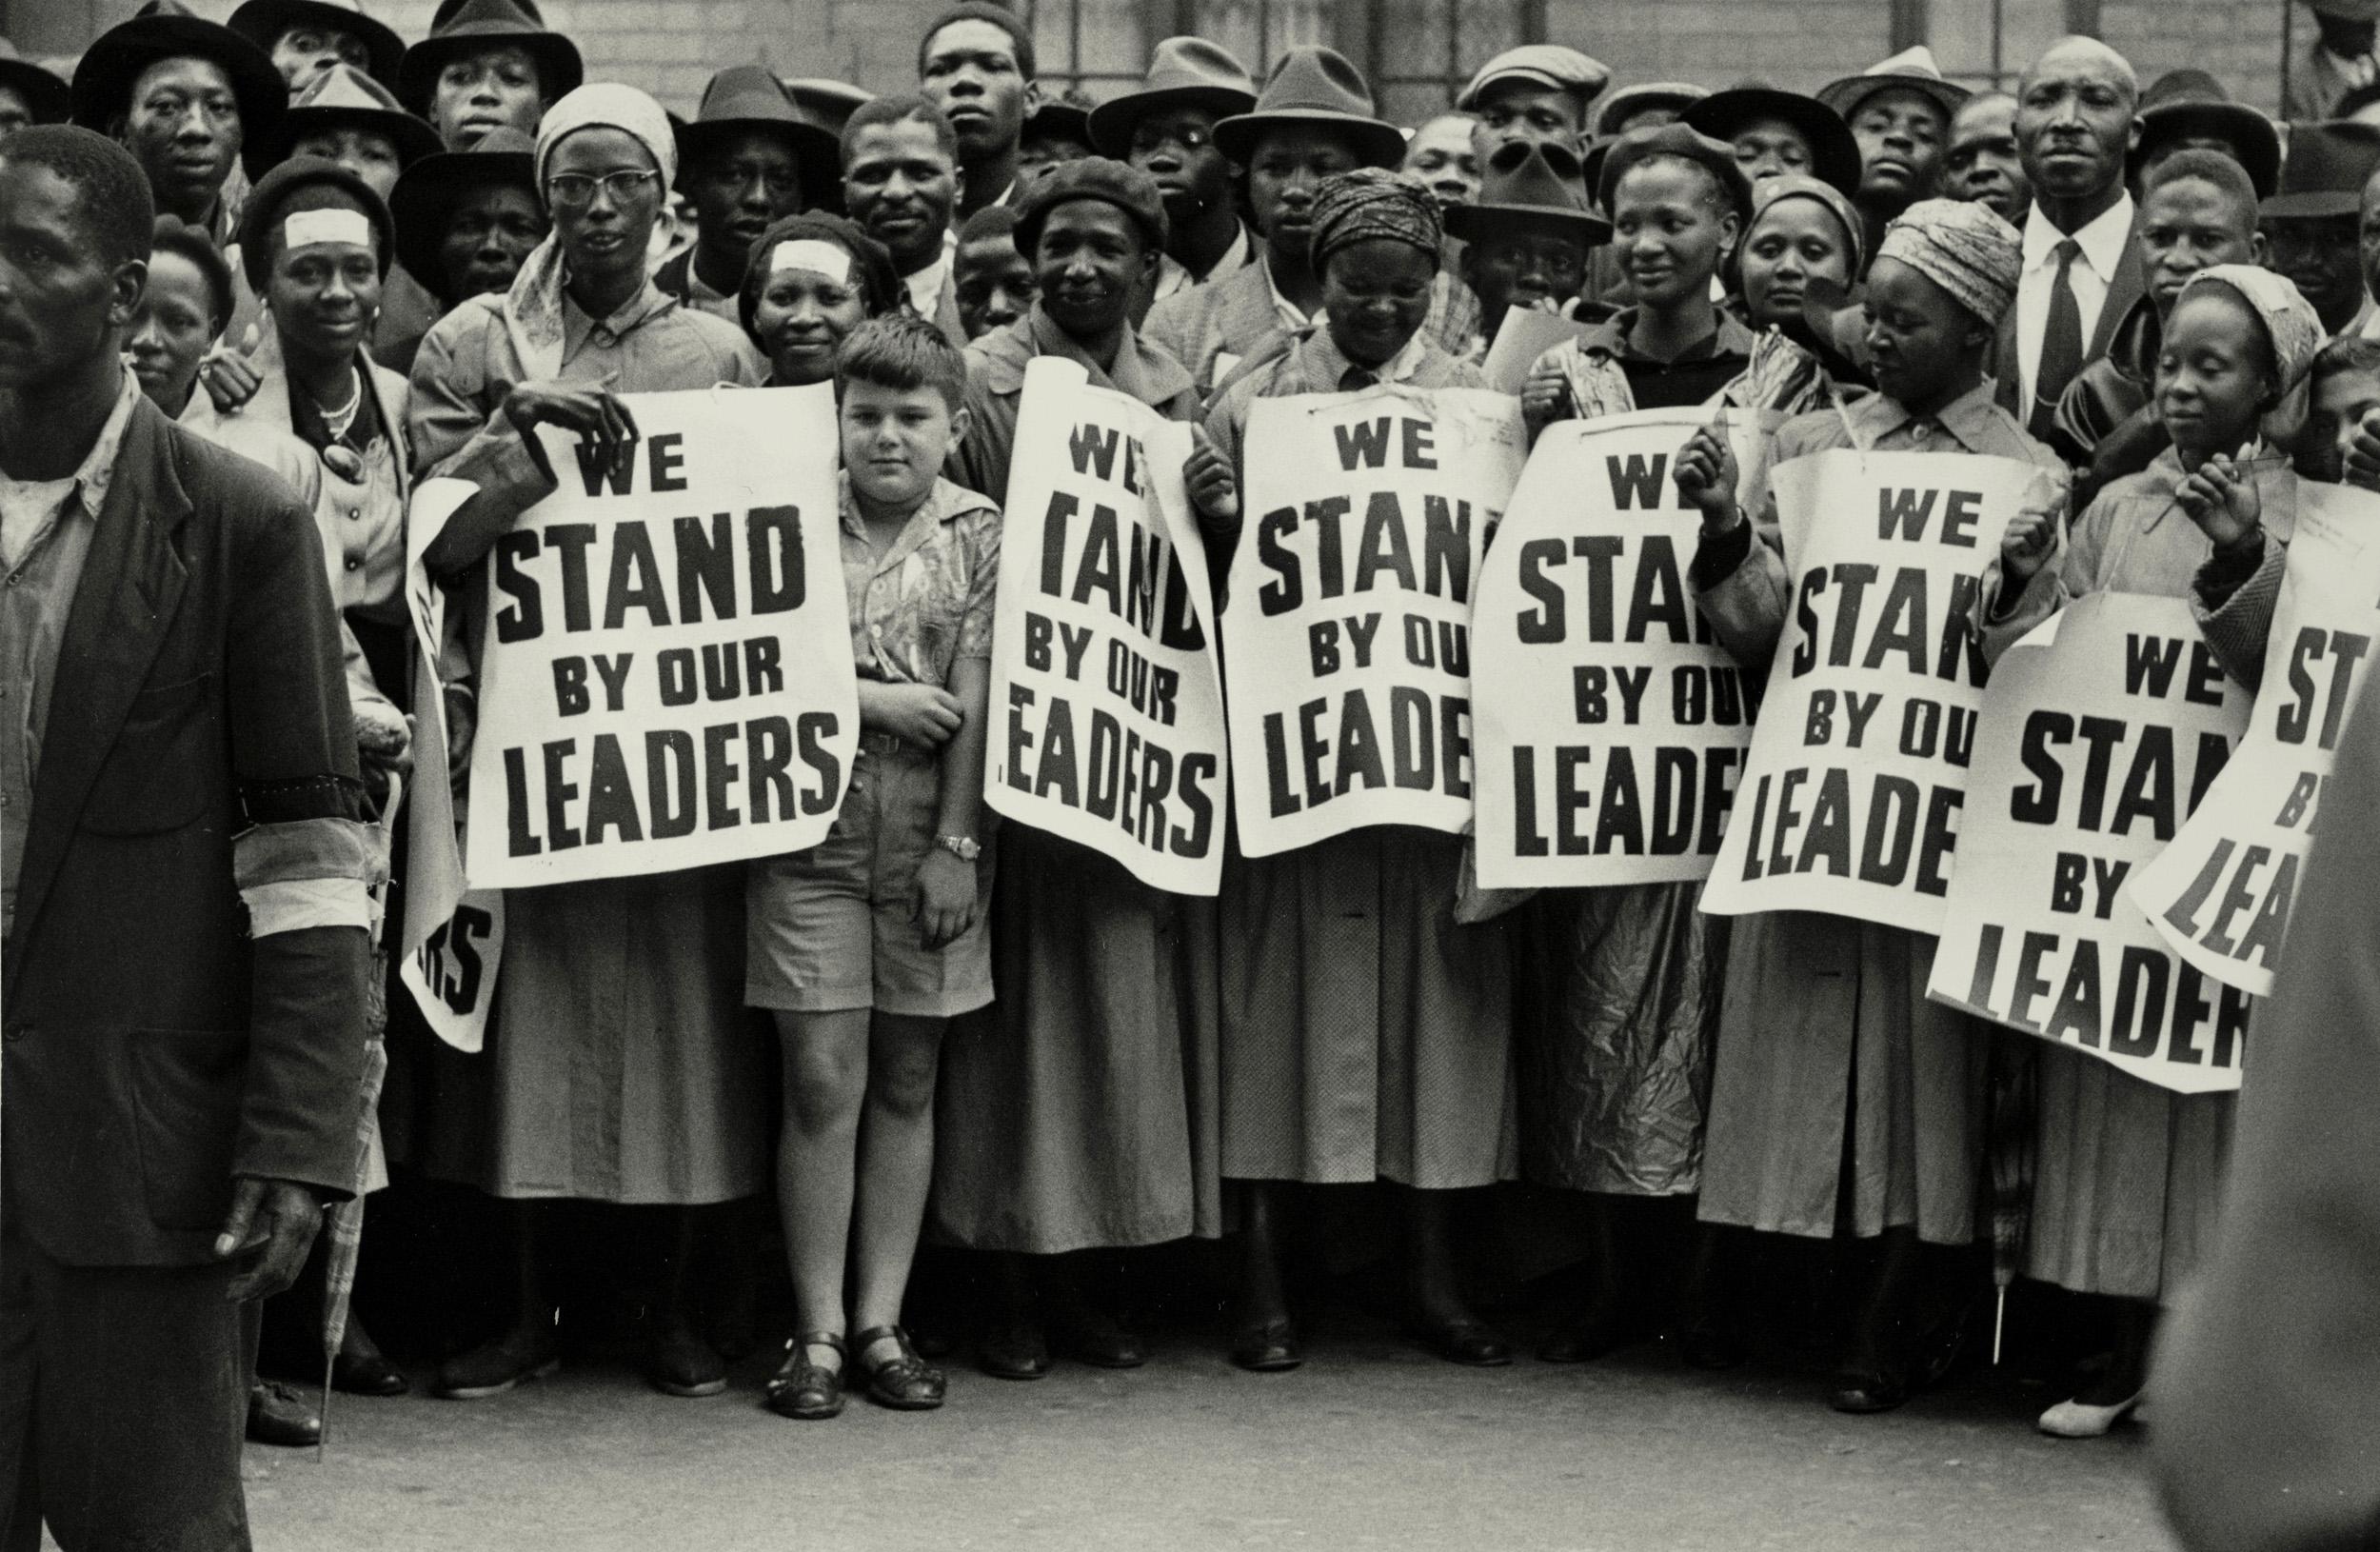 sahistory.org.za/article/despite-1994-political-victory-against-apartheid-its-economic-legacy-persists-haydn-cornish-